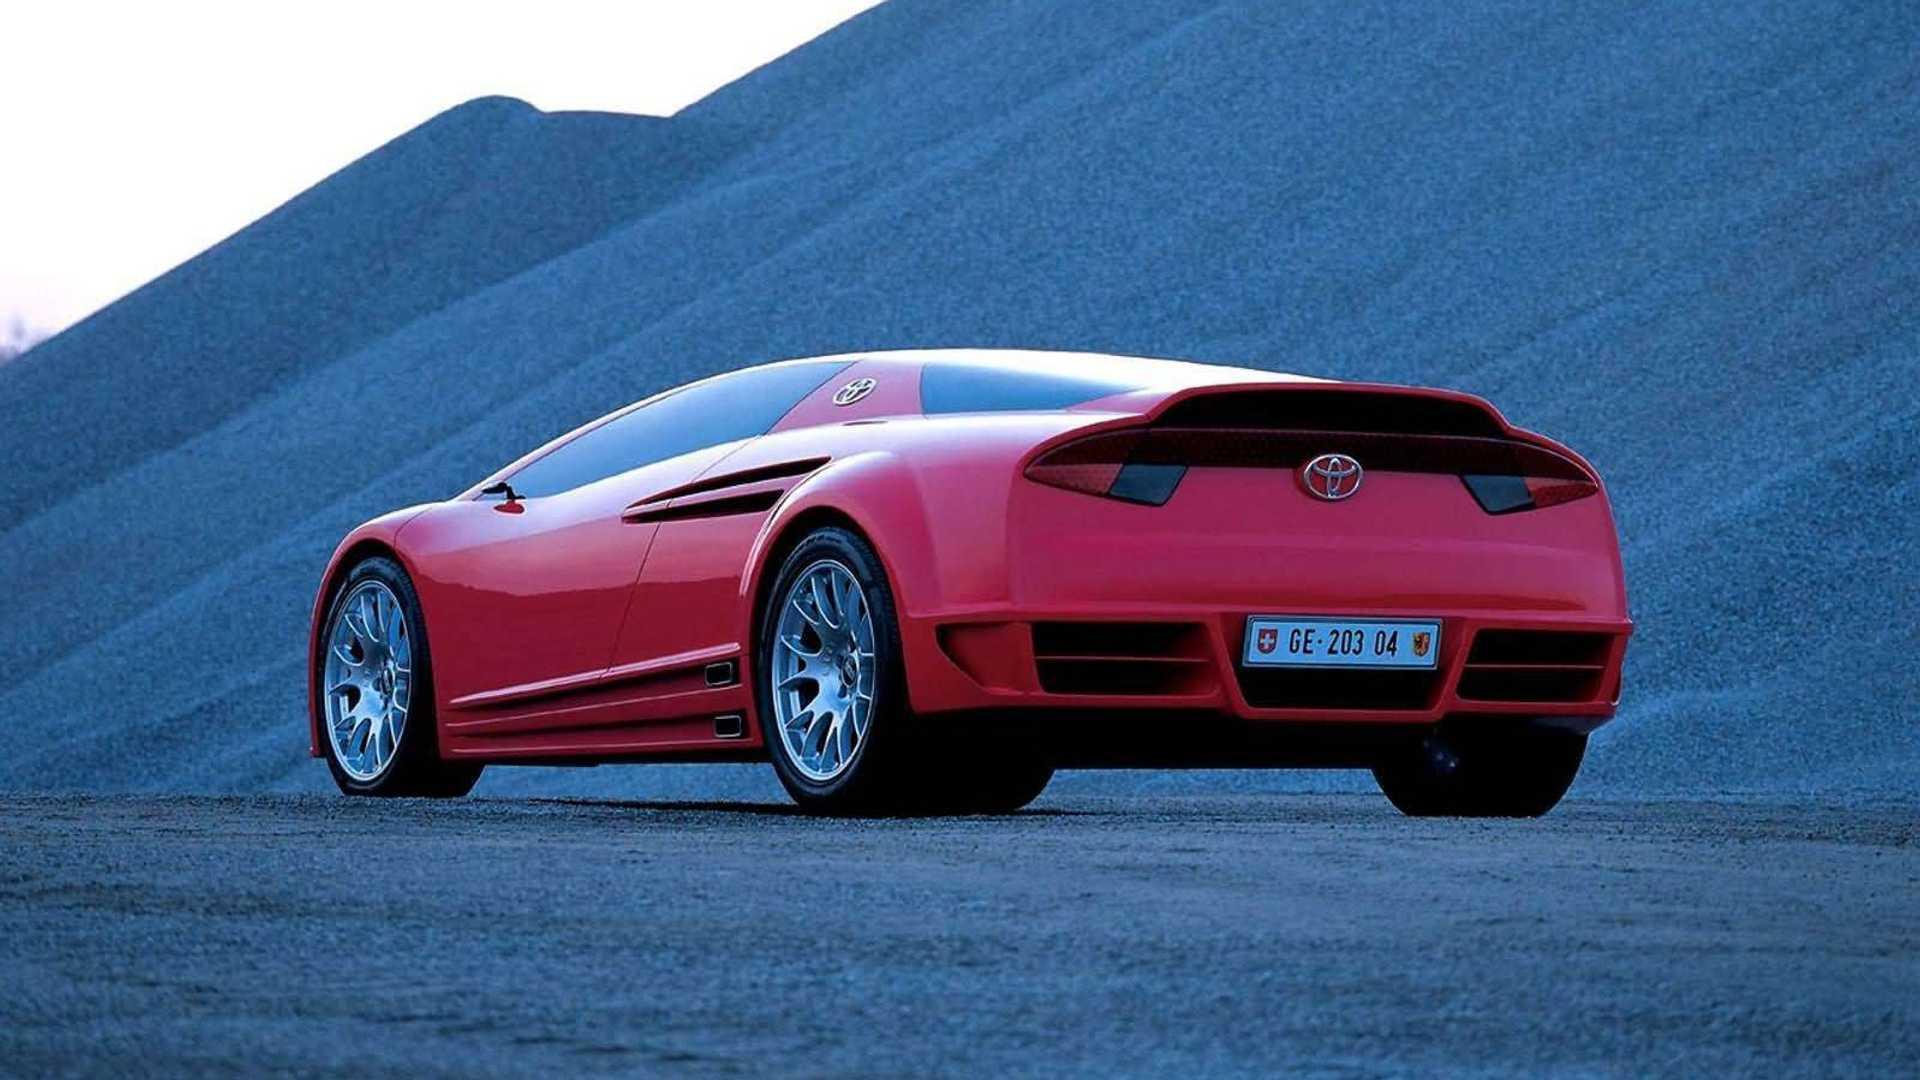 Toyota-Alessandro-Volta-concept-2004-12